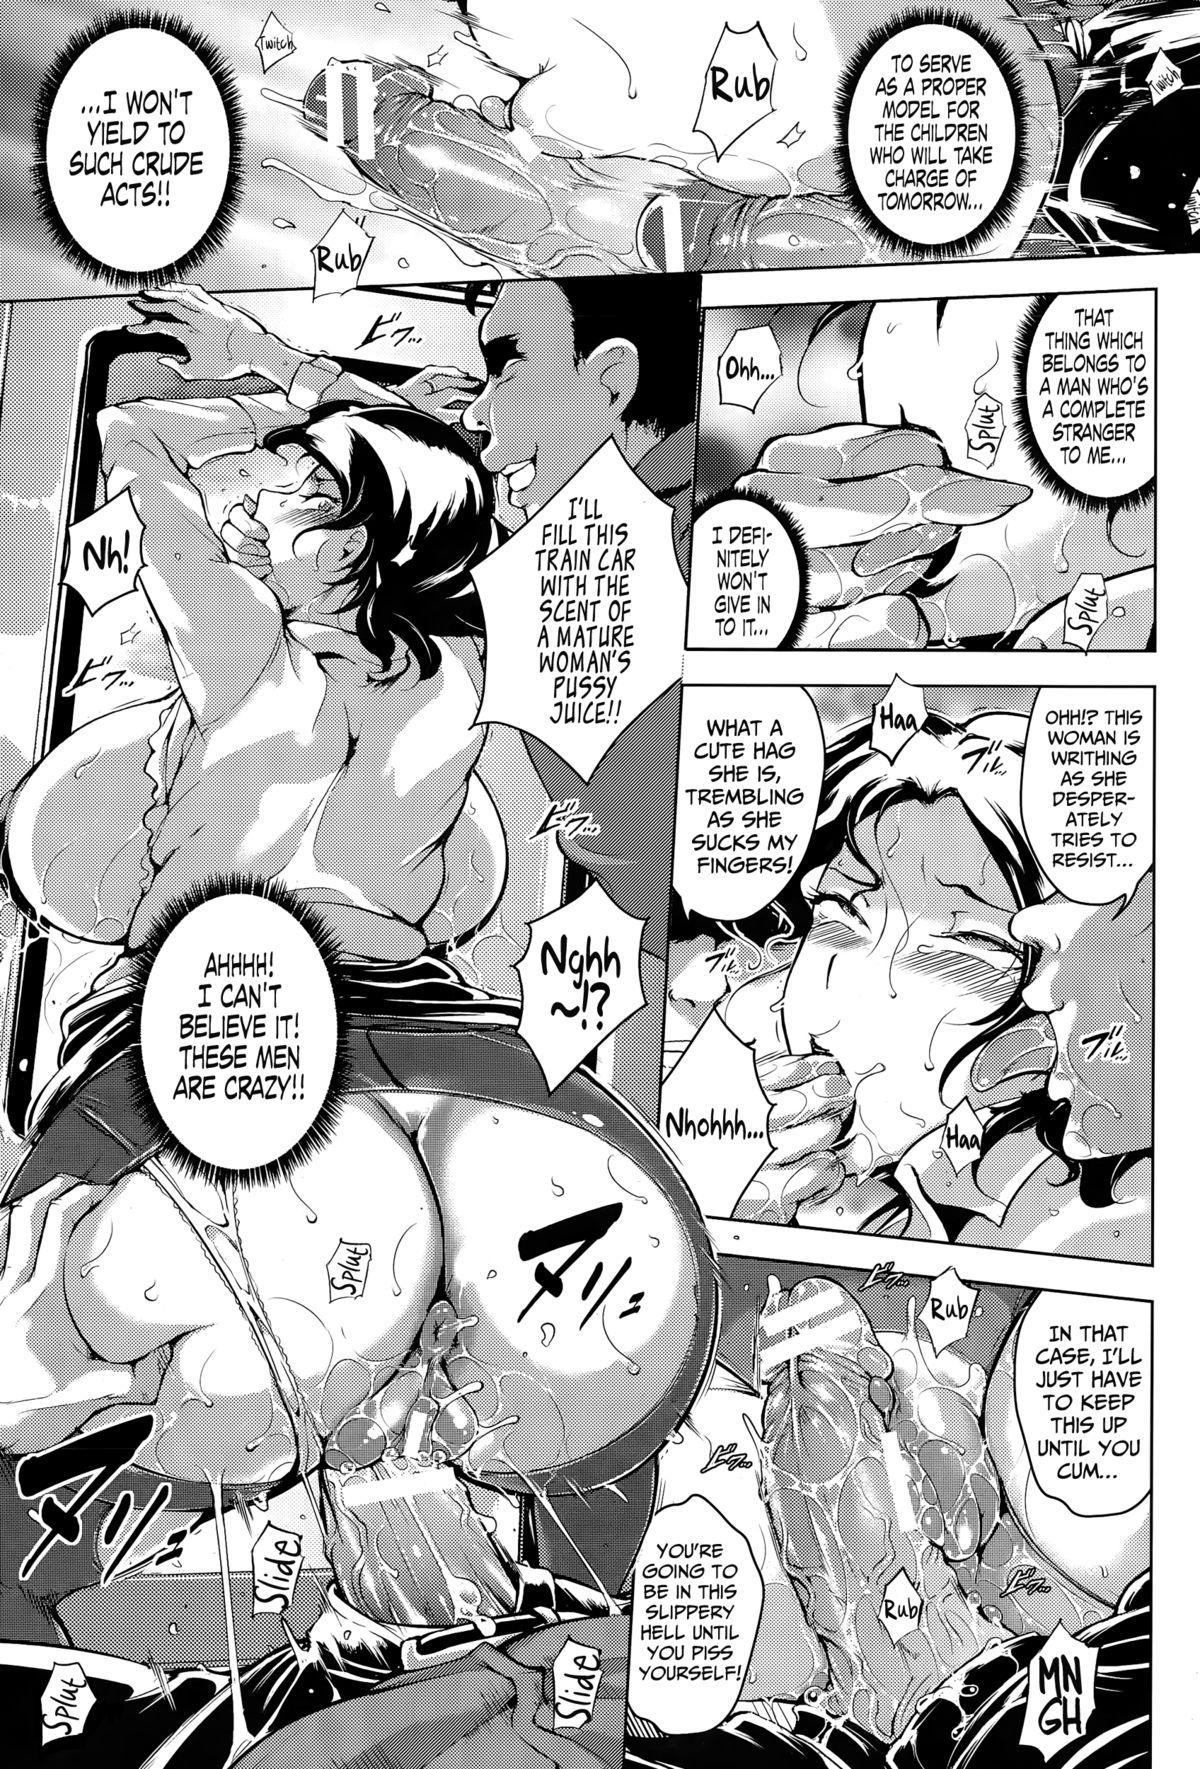 Ryoujyoku Chikan Kyuukou | Rapist Molester Express 6